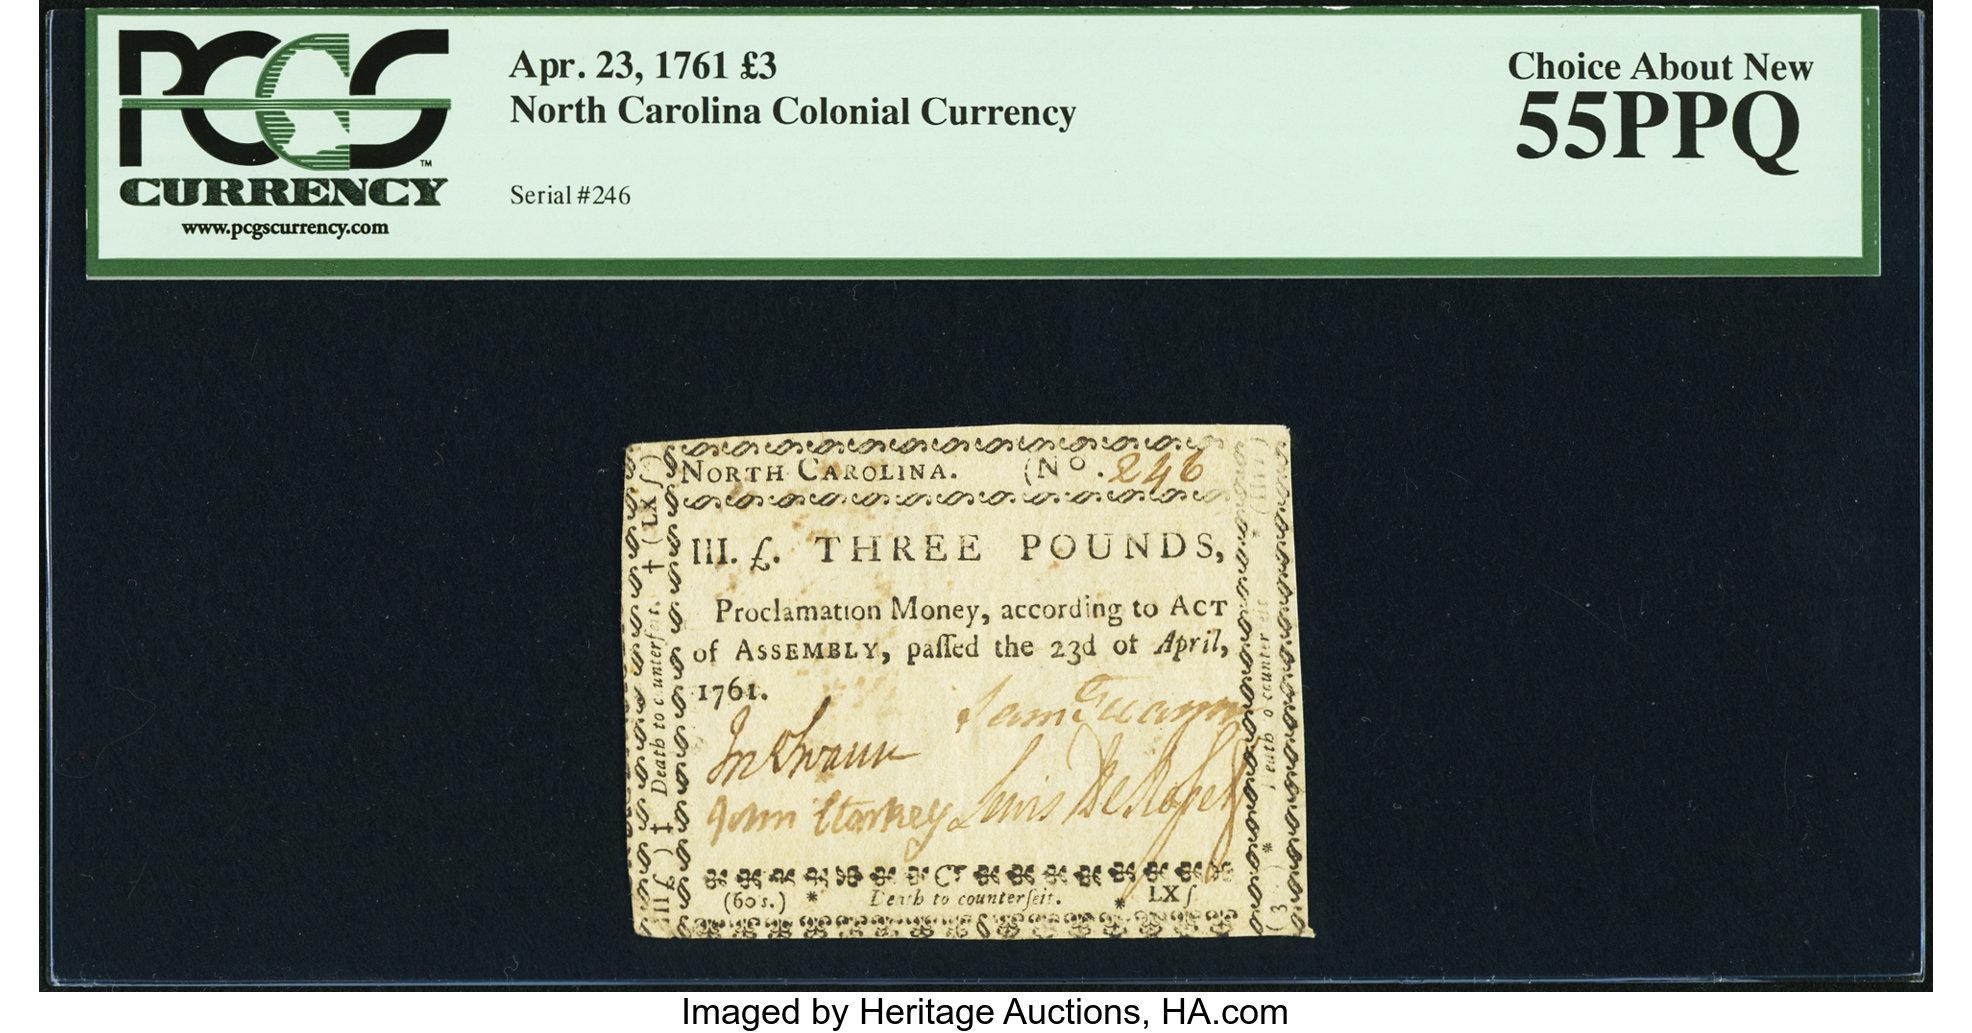 sample image for 1761 23-Apr £3 (Fr.# NC127)